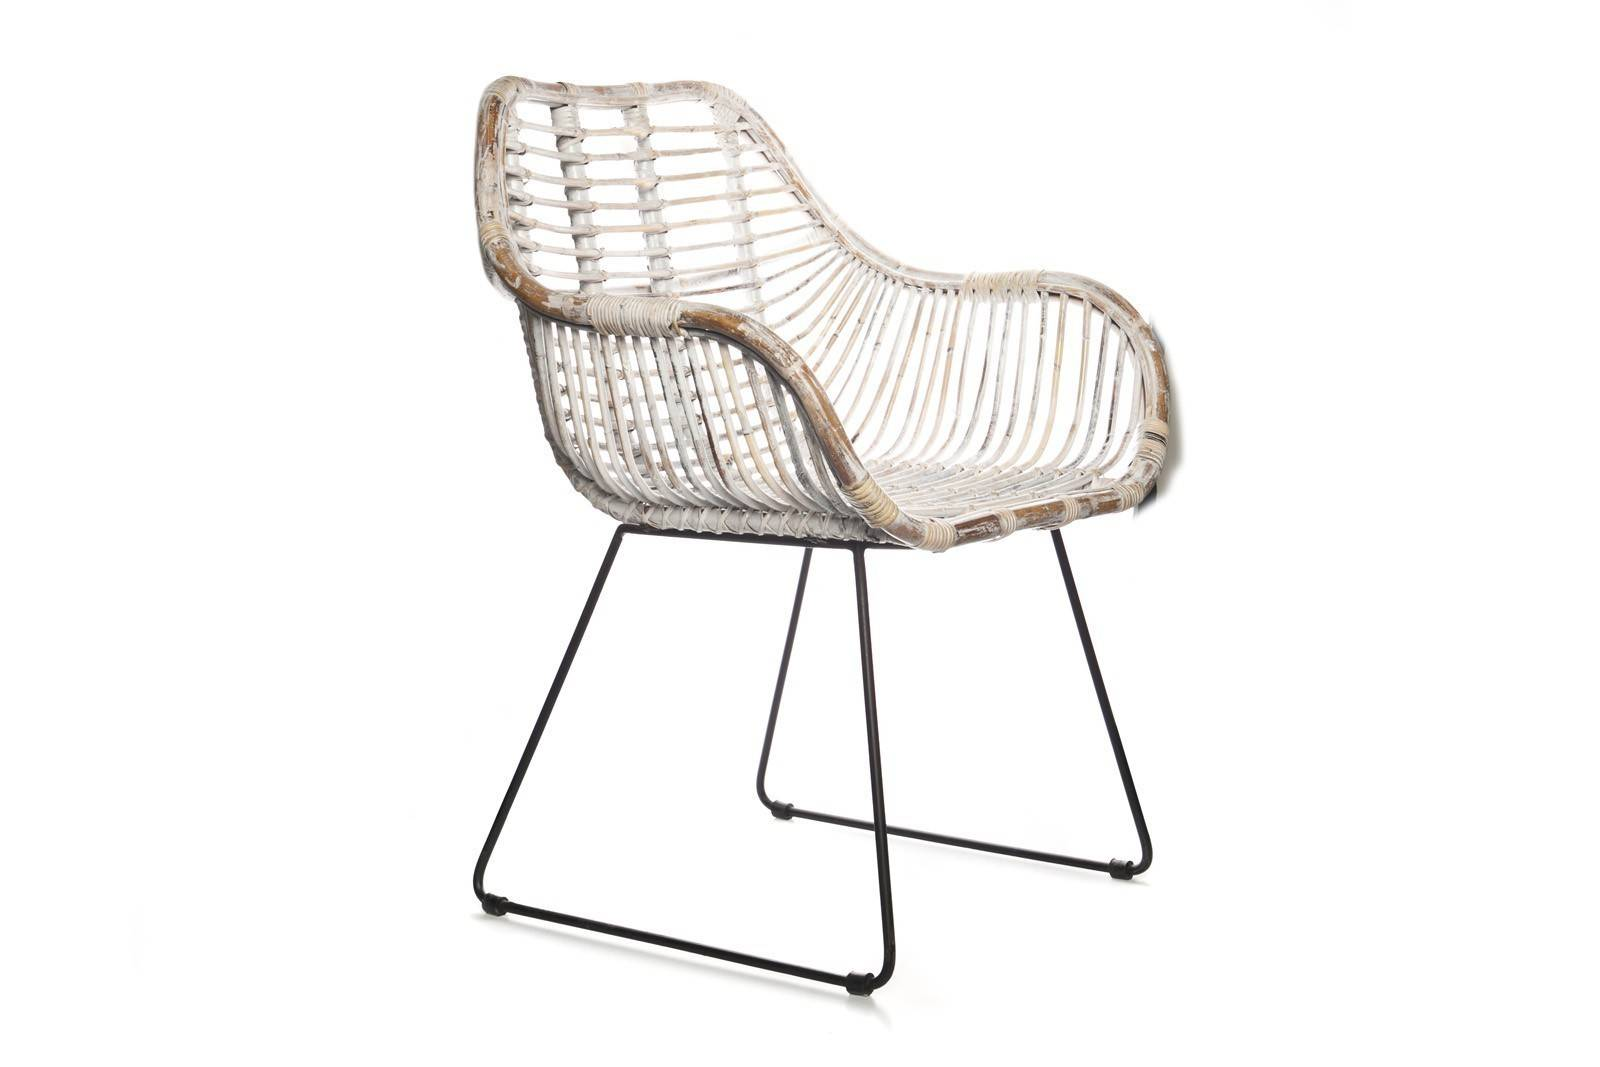 fotele rattanowe ogrodowe LAVAL